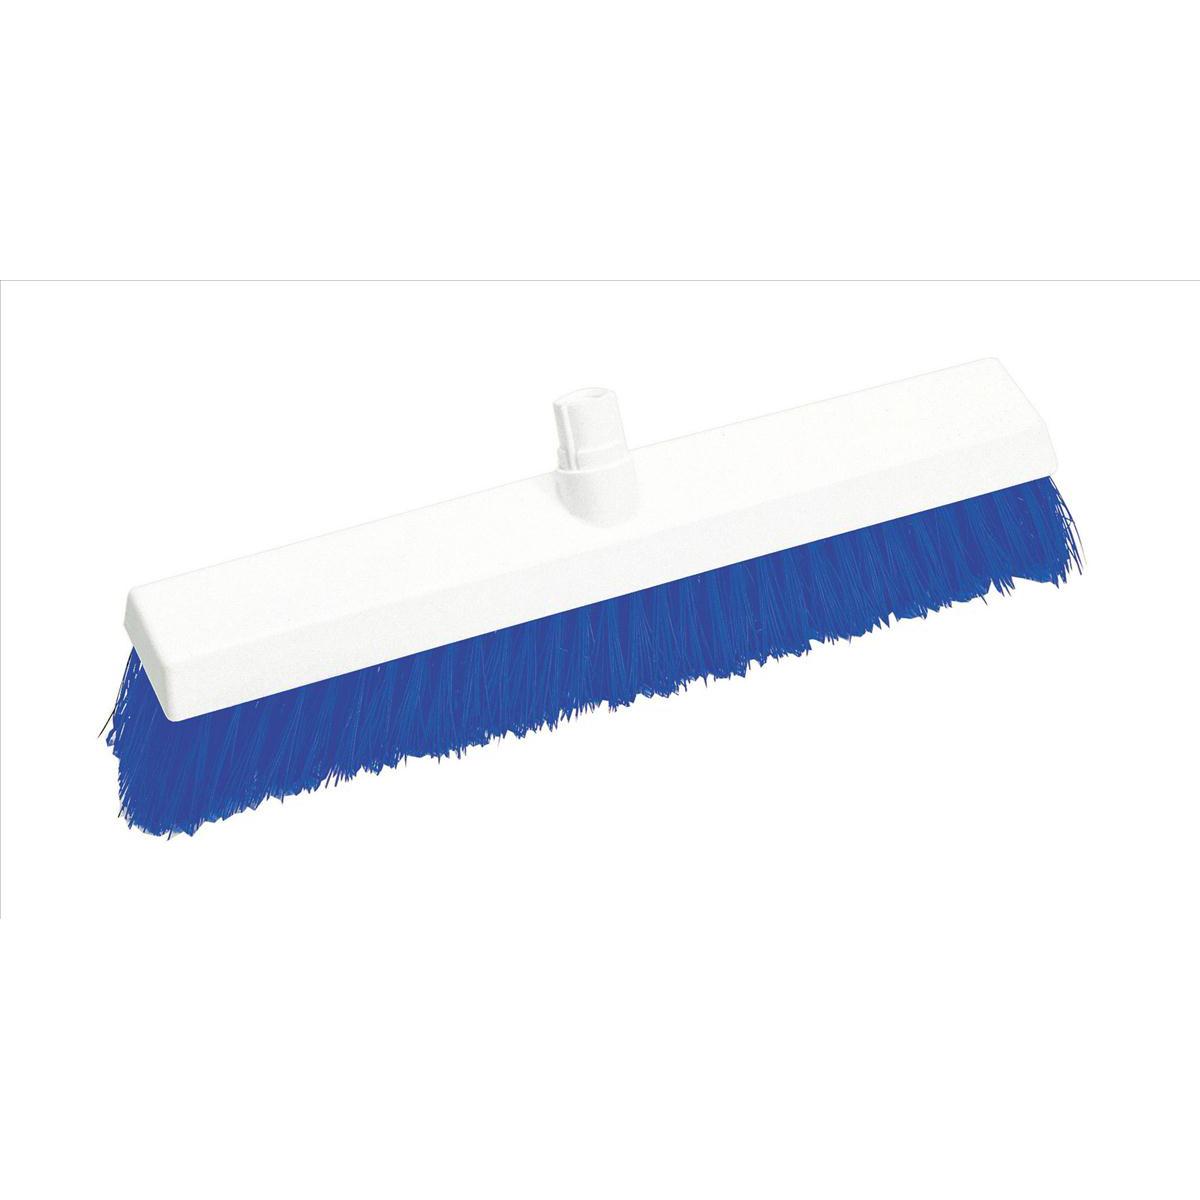 Scott Young Research Interchange Hygiene Soft Broom Head 12 Inch Blue Ref BHY12SB